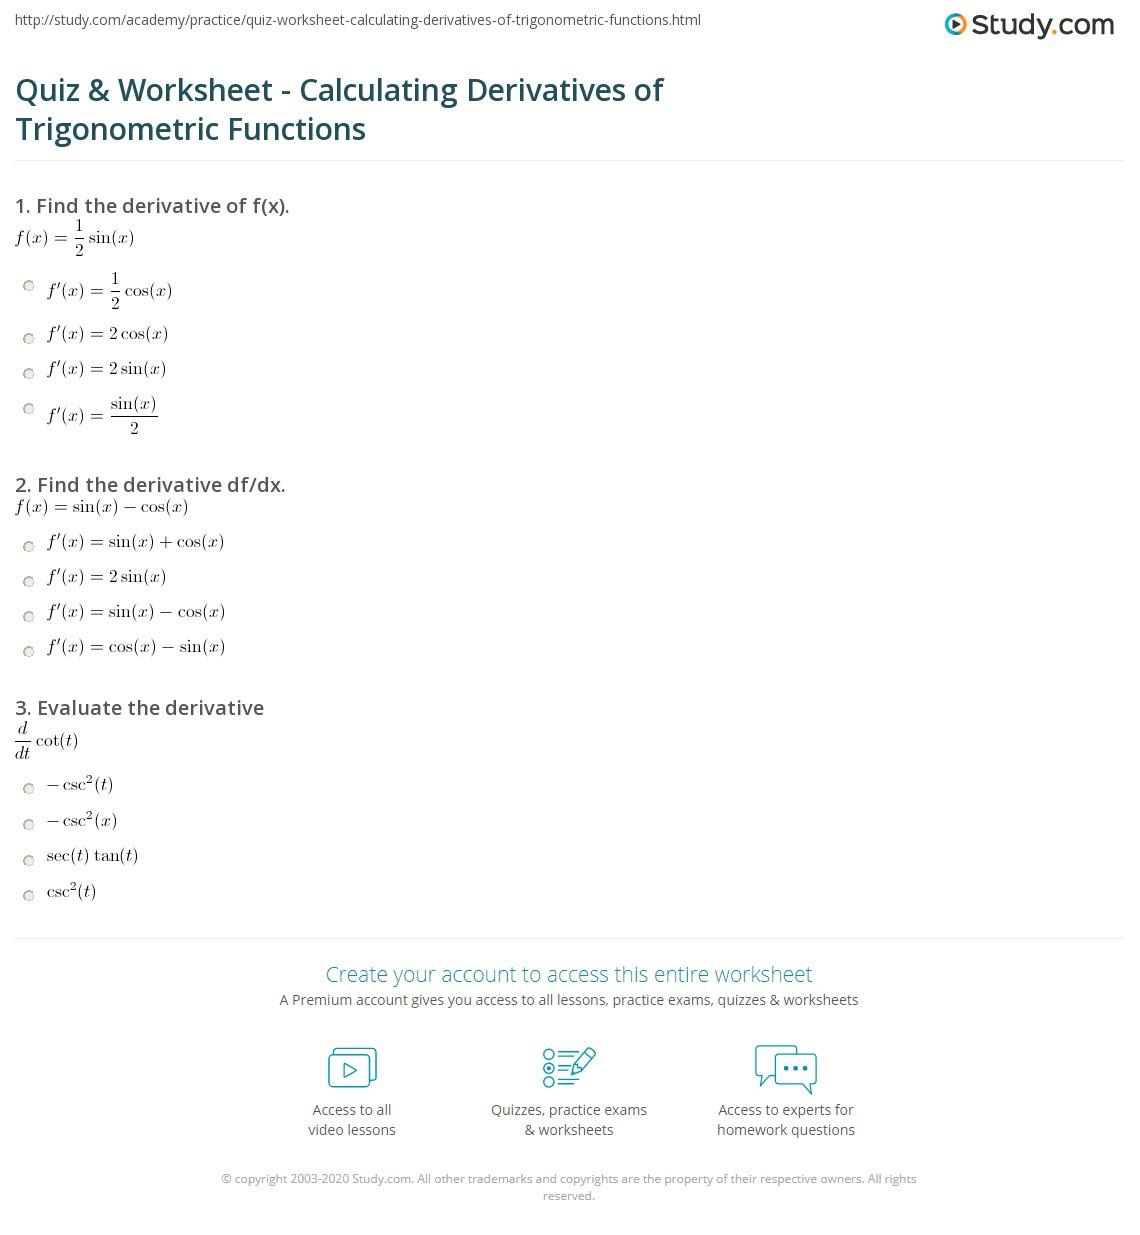 Quiz & Worksheet Calculating Derivatives of Trigonometric